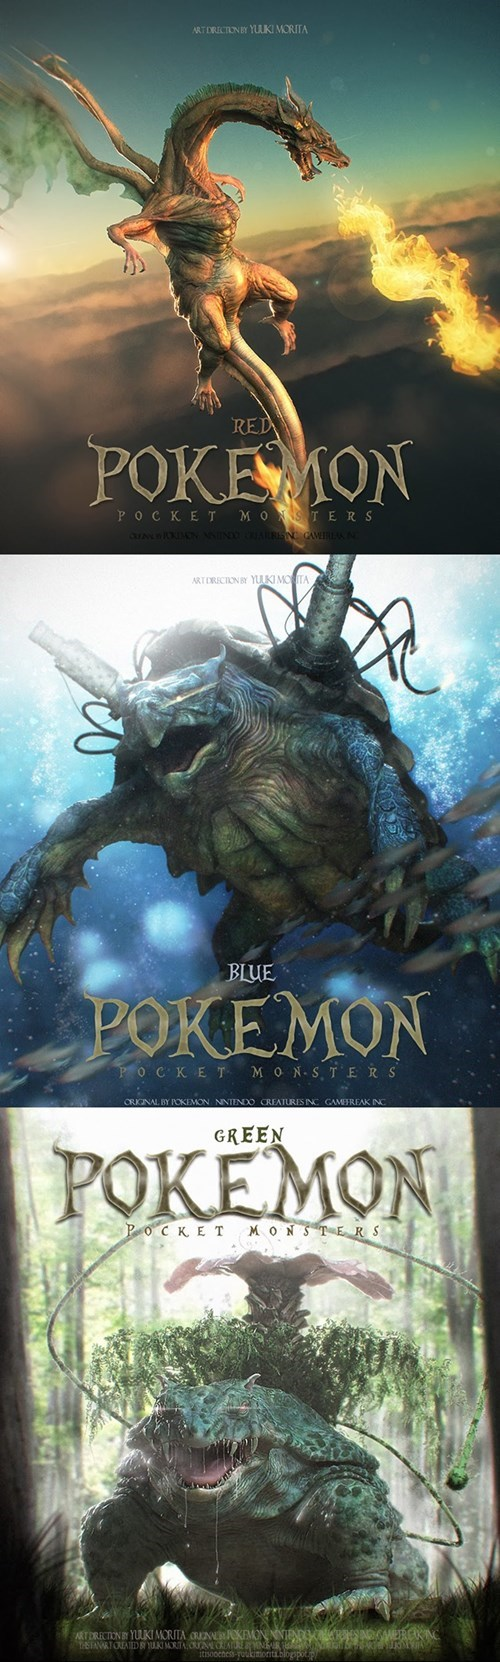 Pokémon,FanArt,blastoise,charizard,venusaur